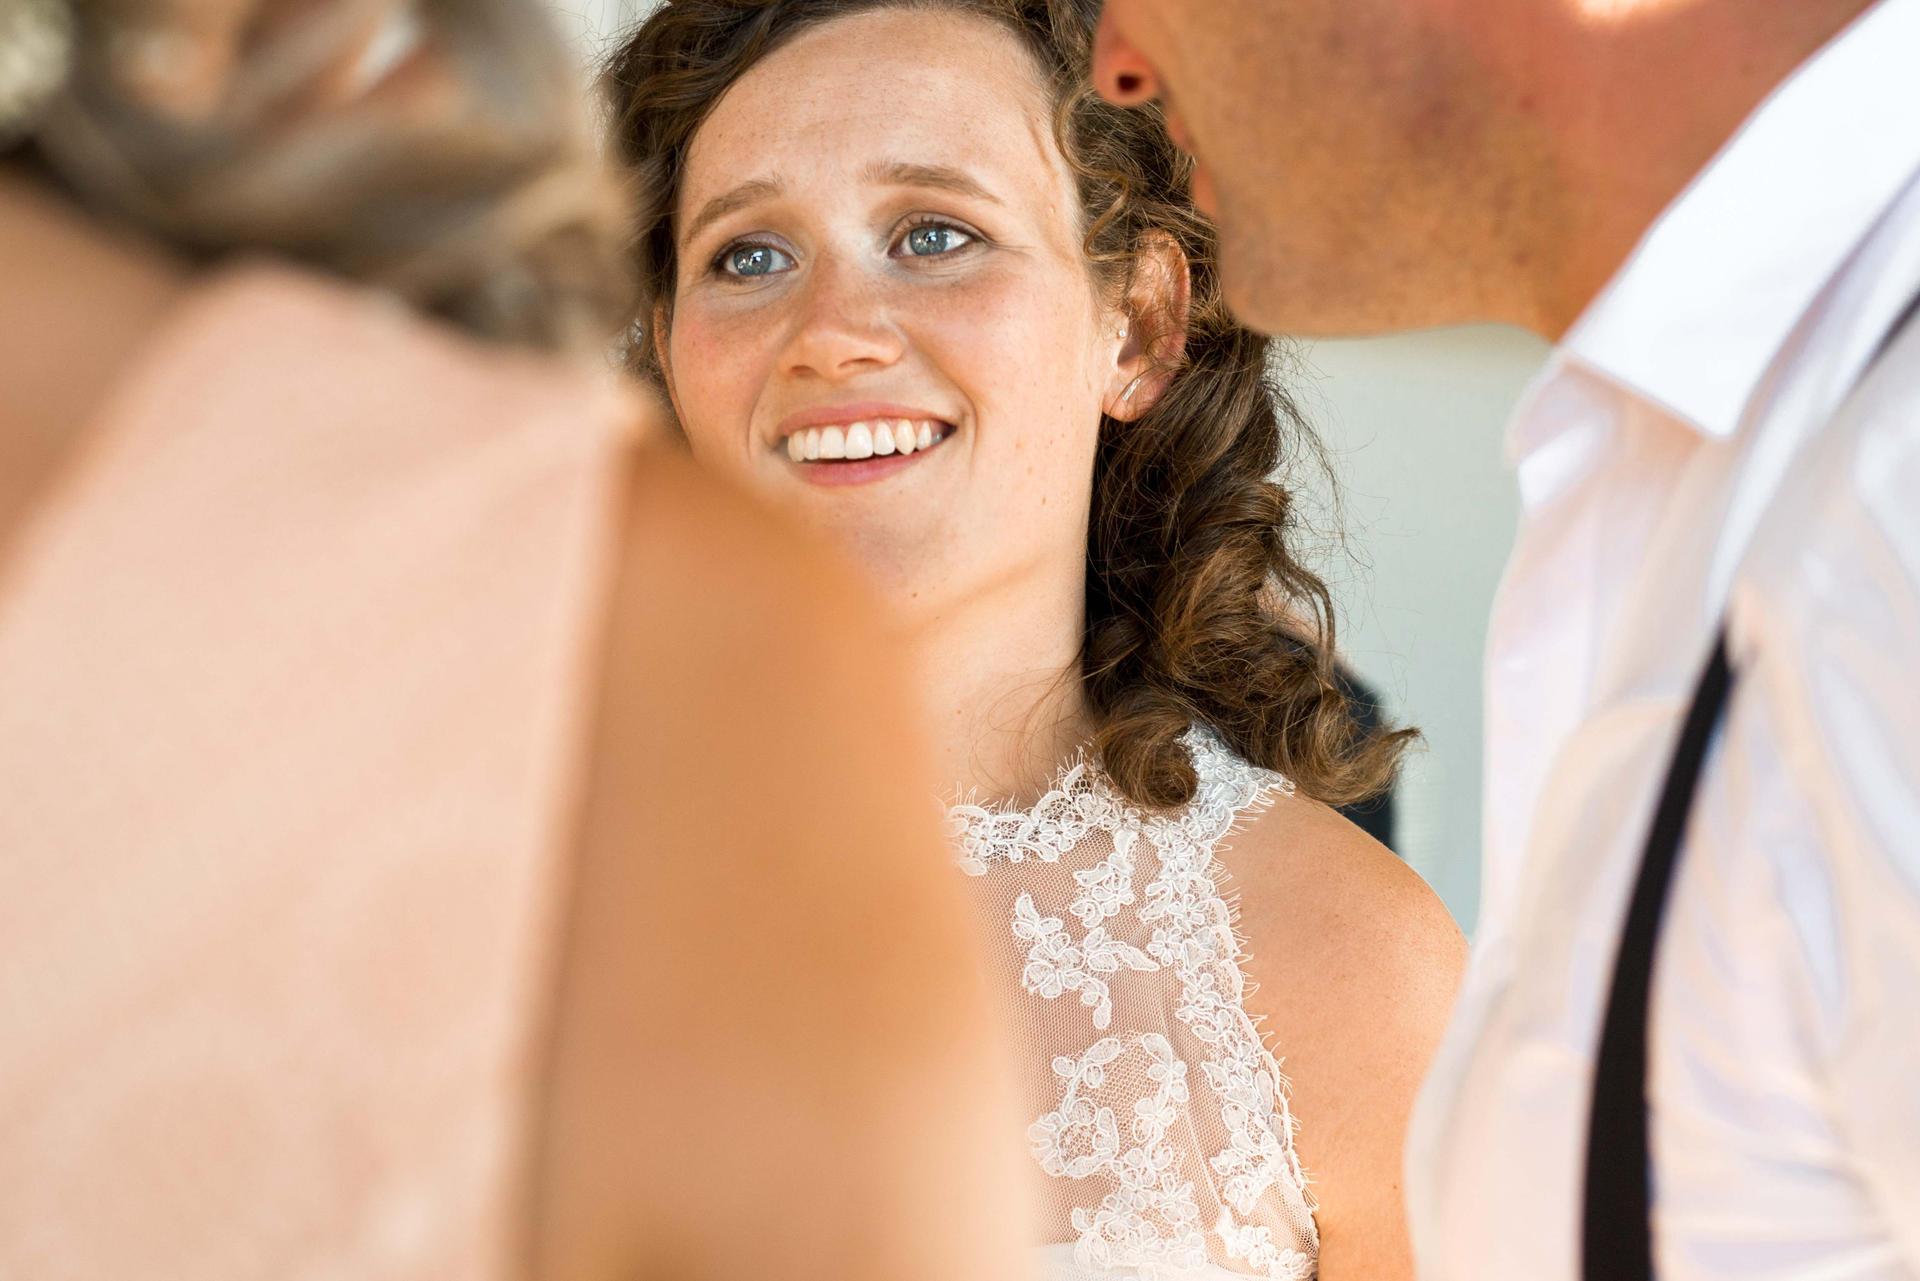 Bruiloft klein website -46.jpg